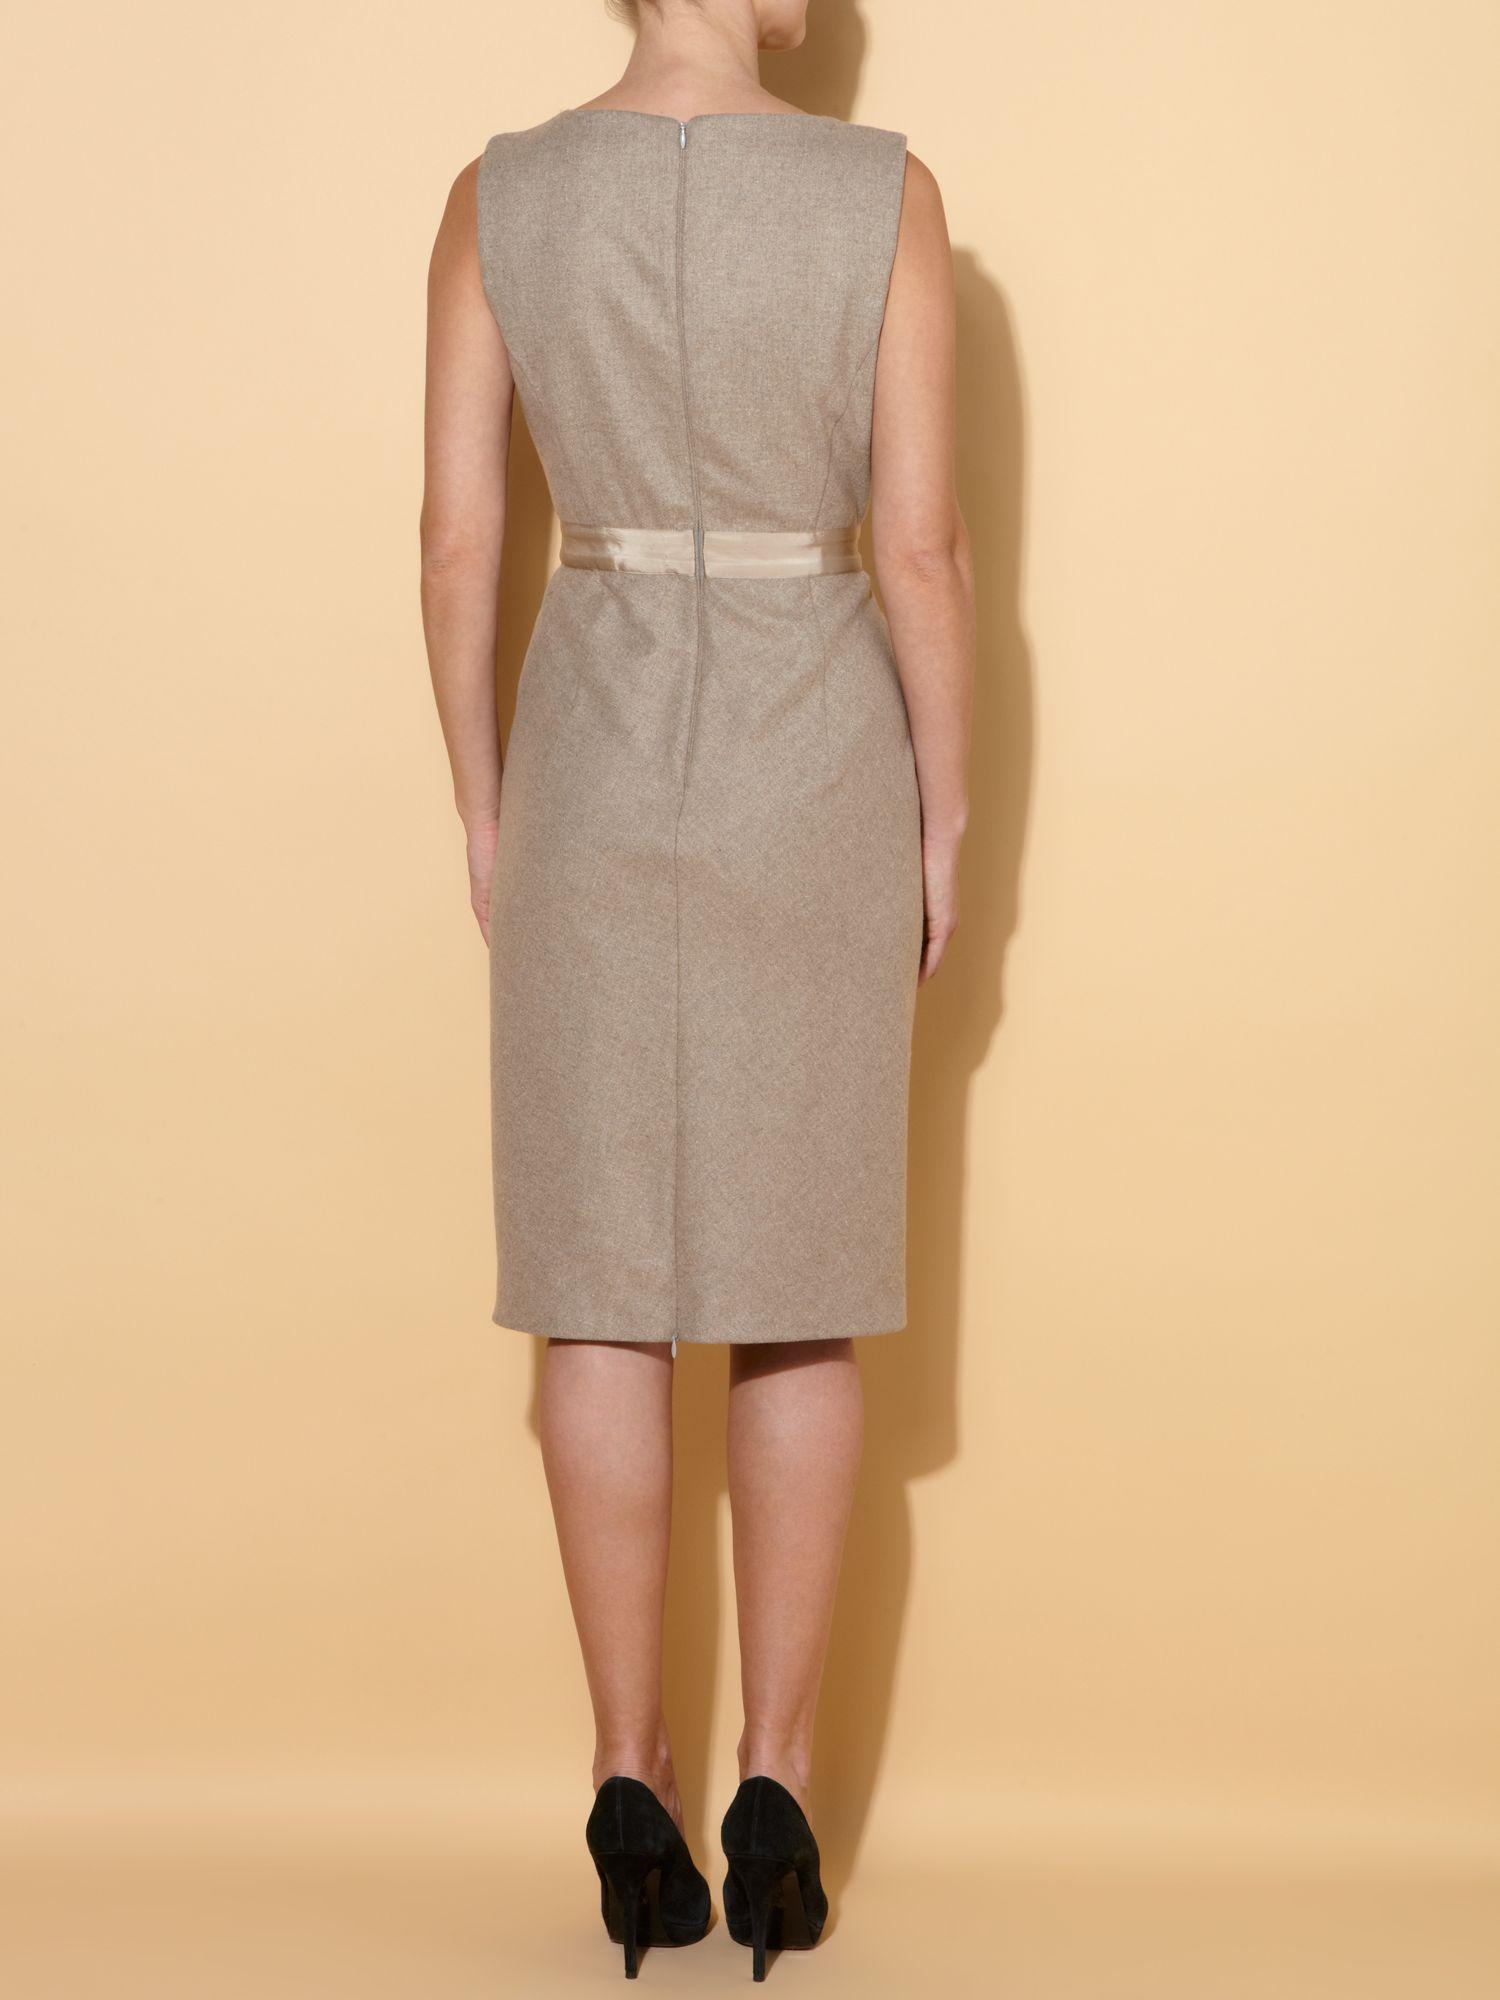 max mara studio sole sleeveless tunic dress with bow waist. Black Bedroom Furniture Sets. Home Design Ideas